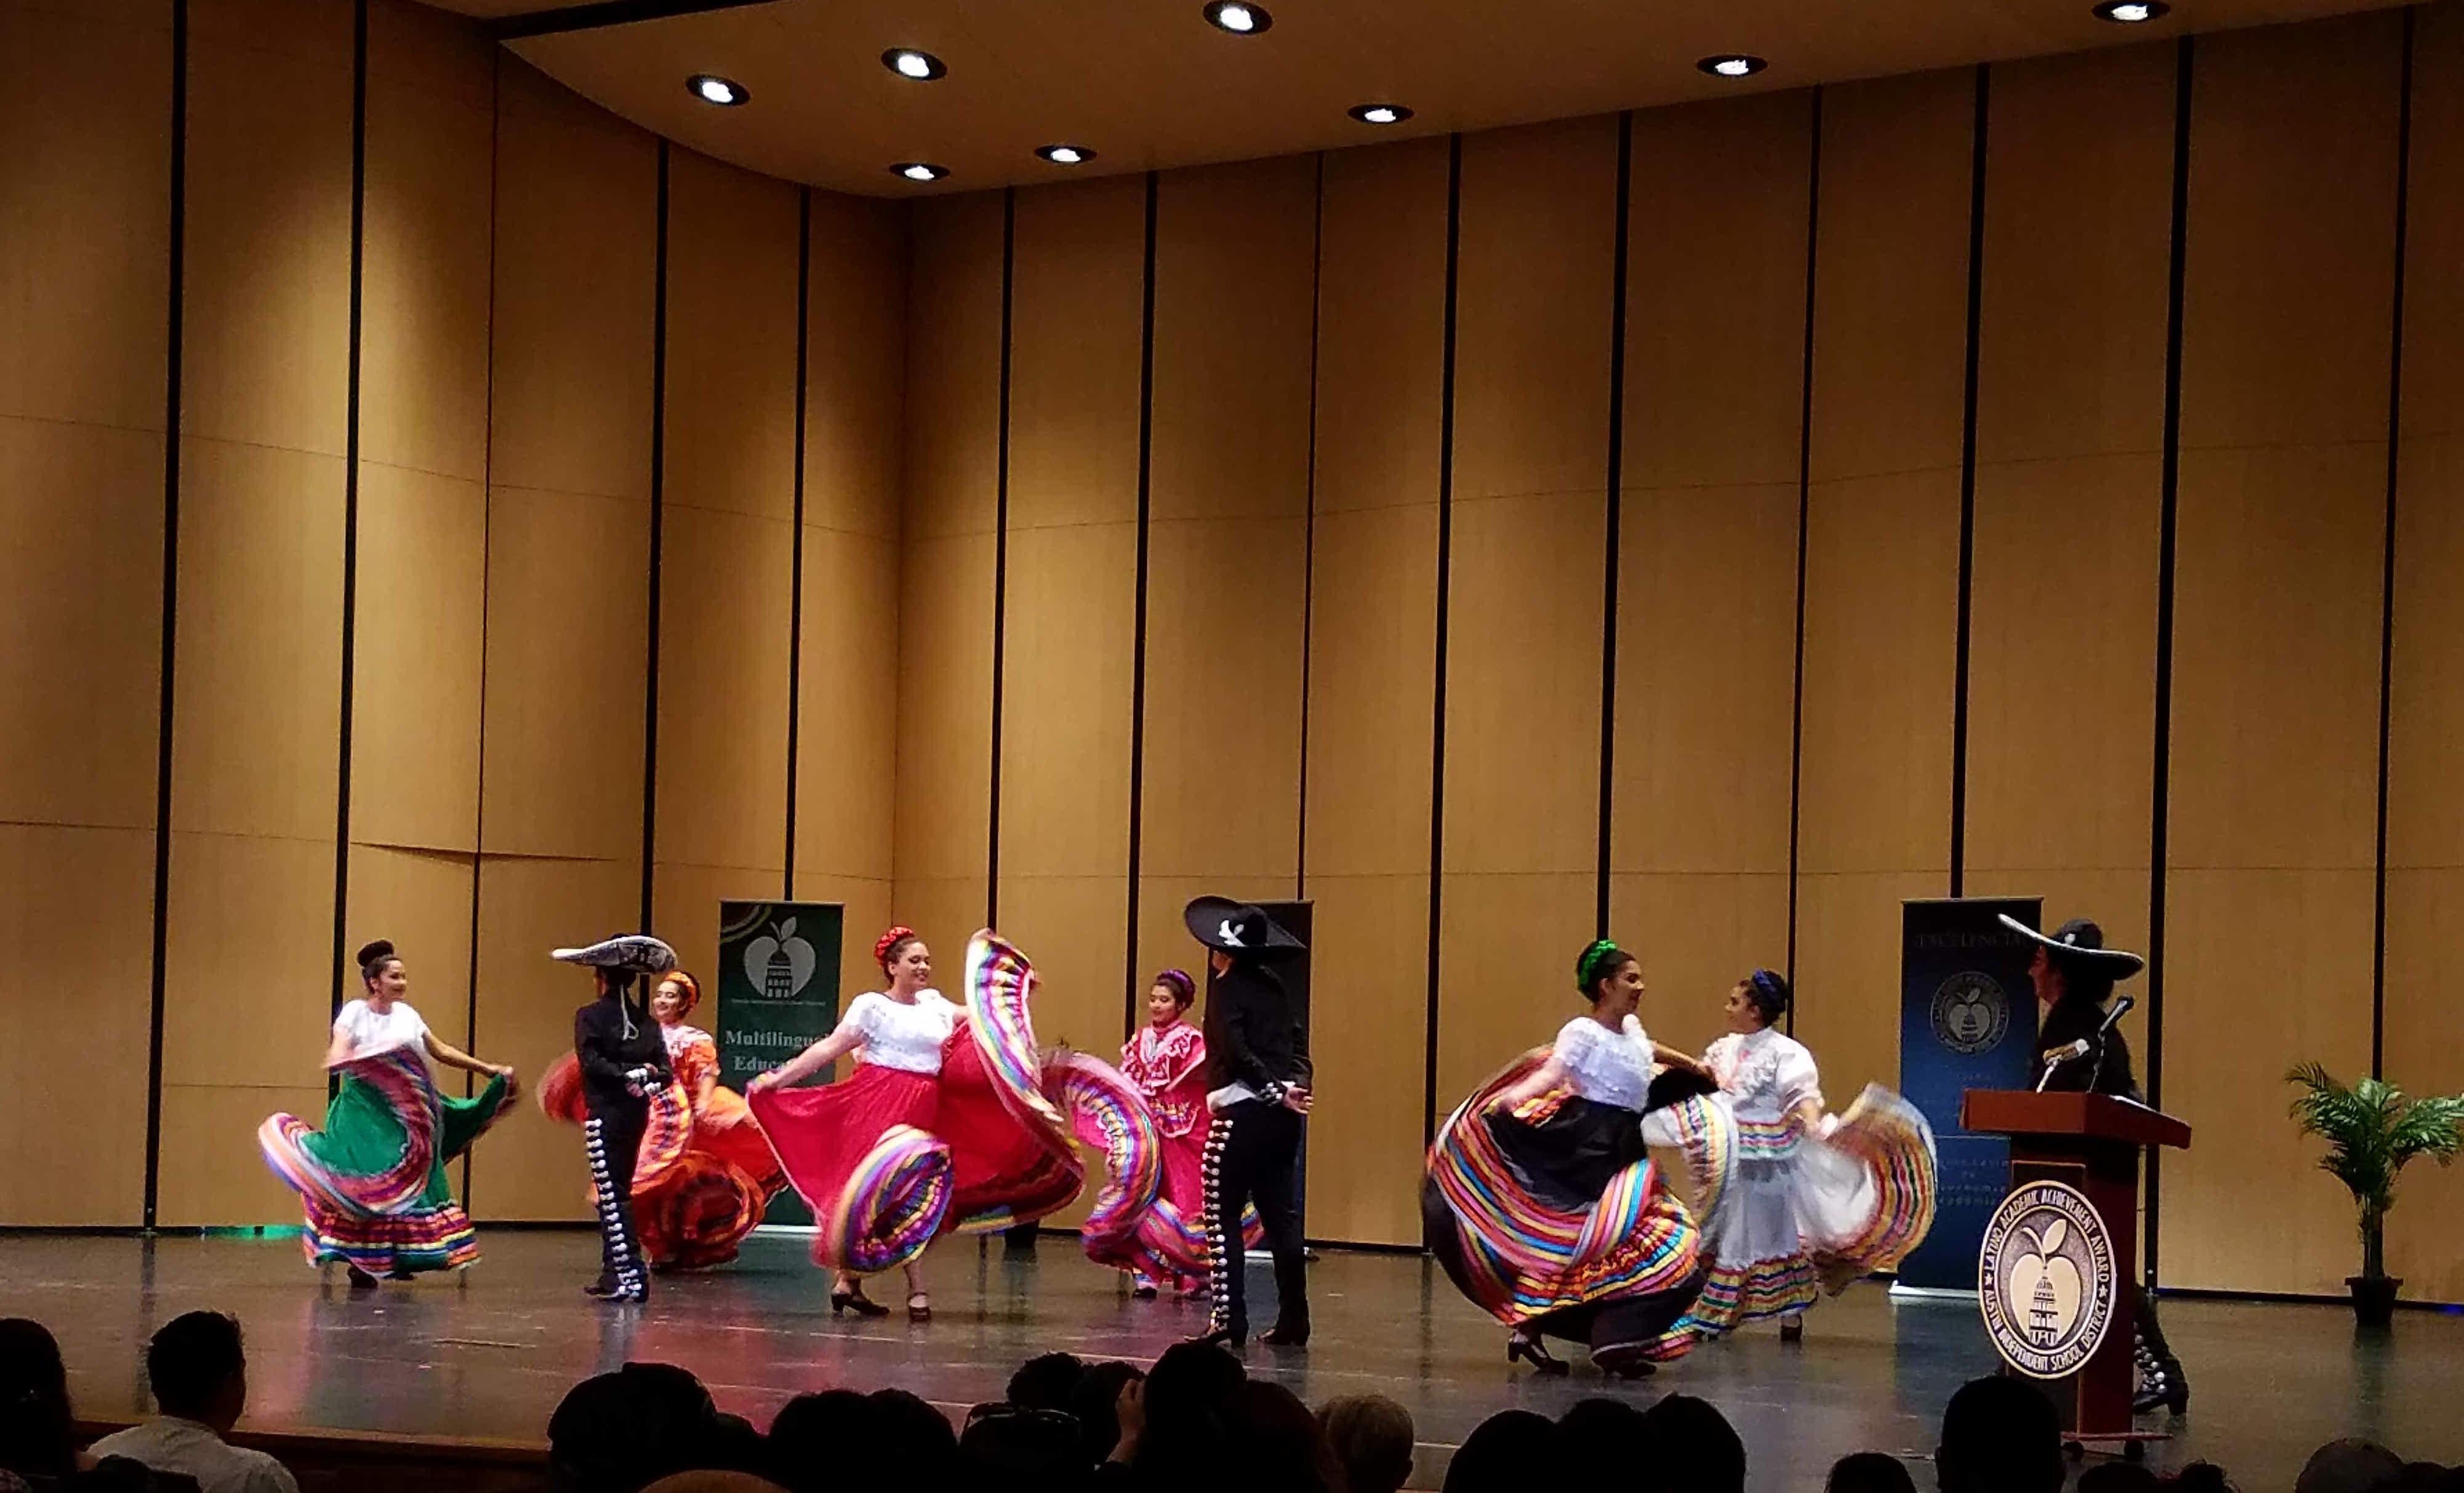 2018 AISD ¡EXCELENCIA! Latino Academic Achievement Awards